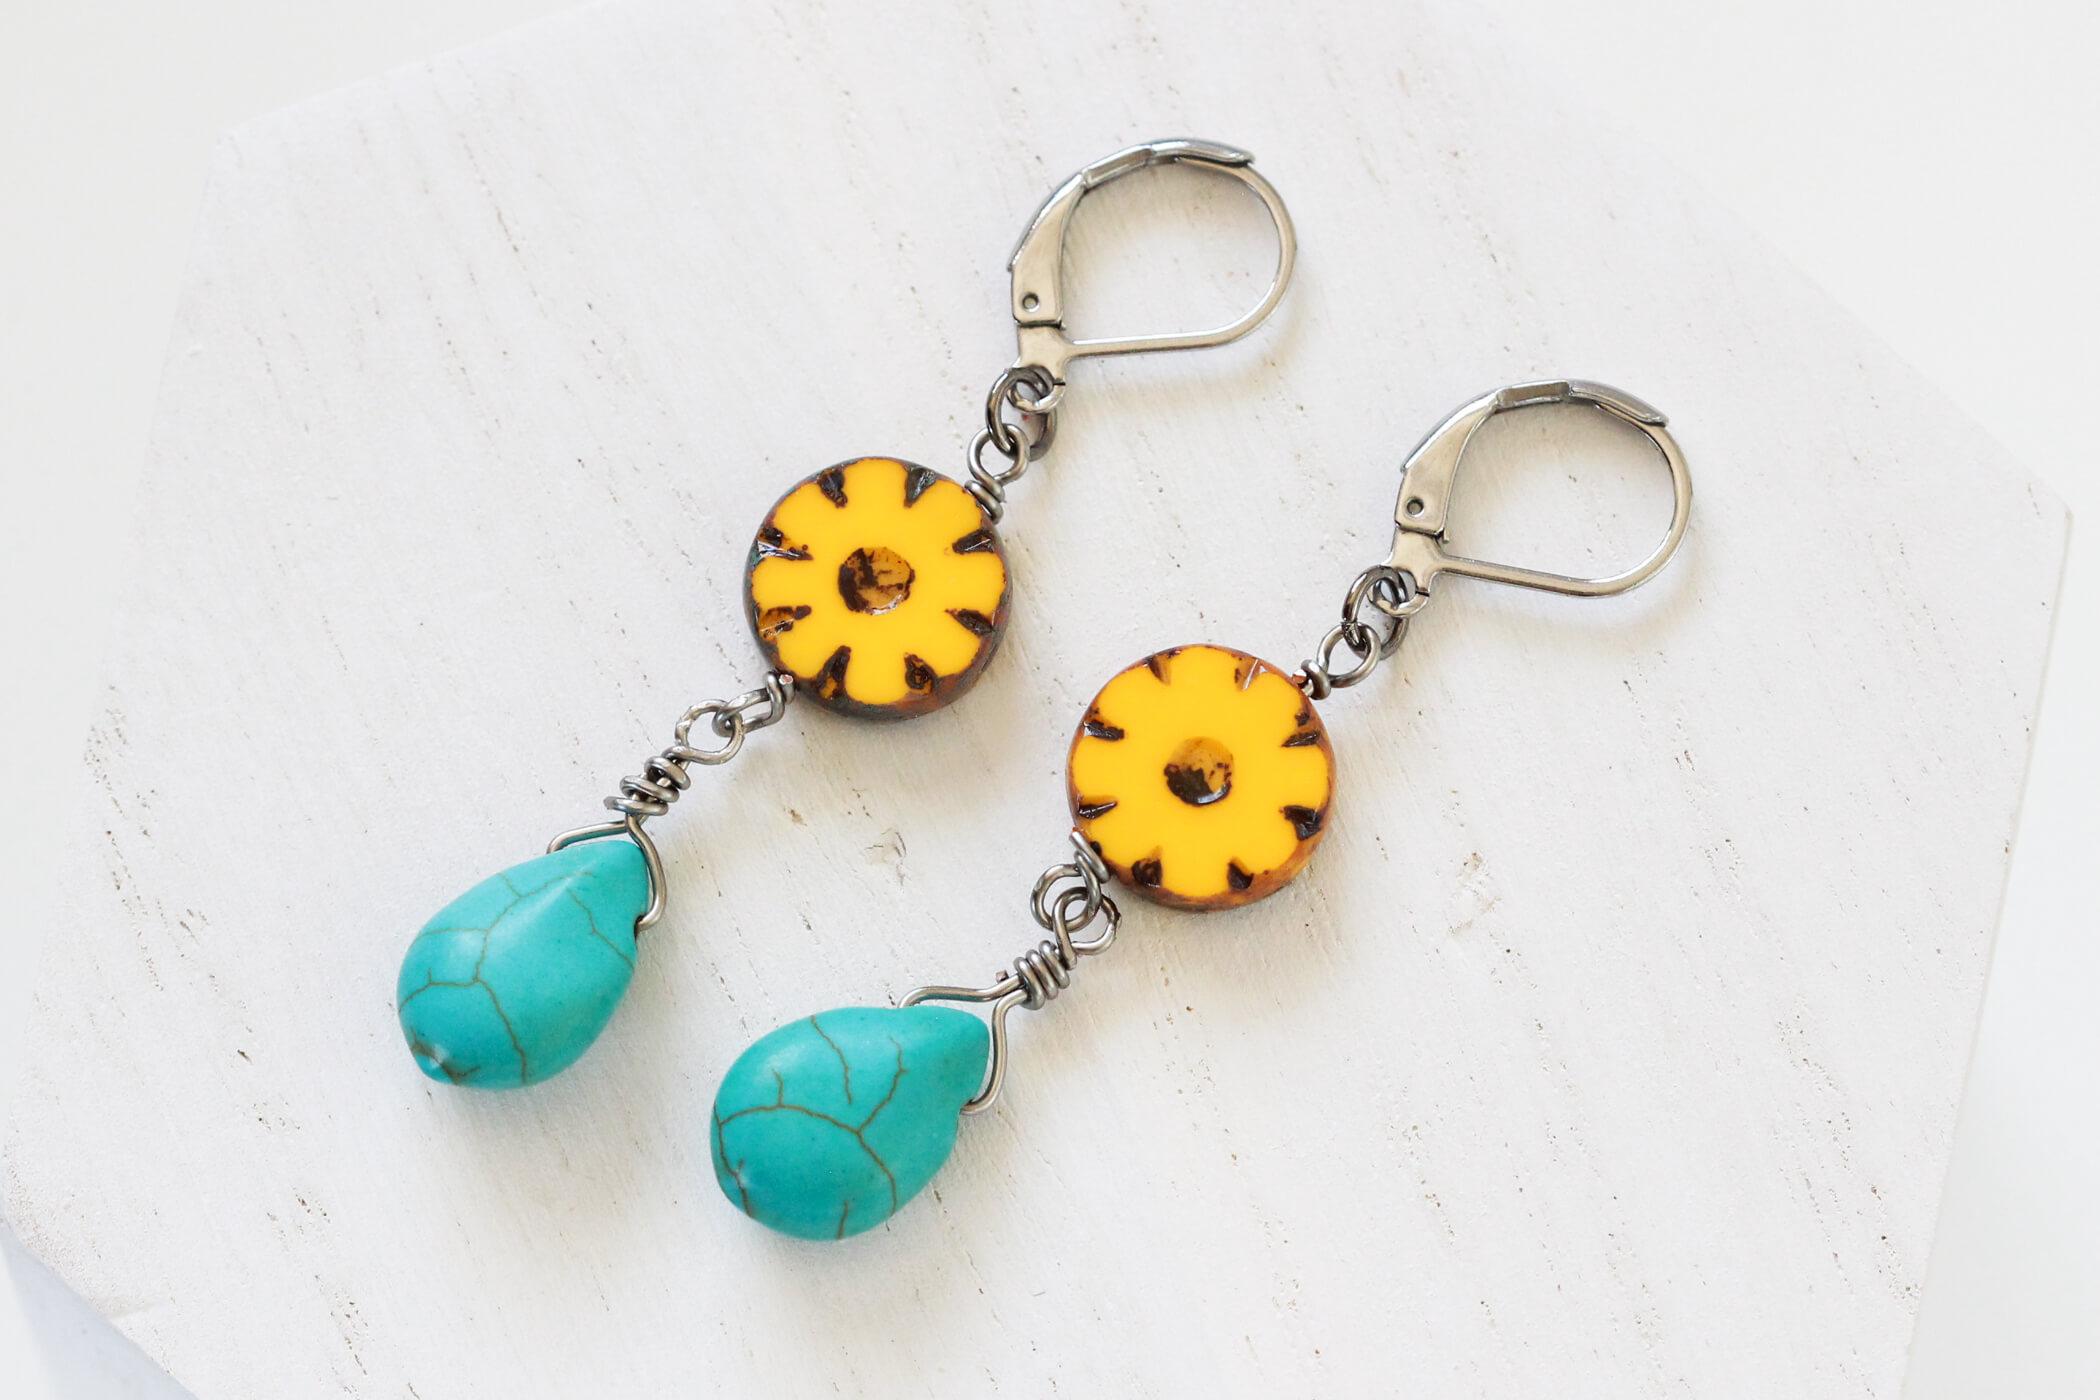 Yellow Flower Drop Earrings – Earrings For Work by Kaleidoscopes And Polka Dots